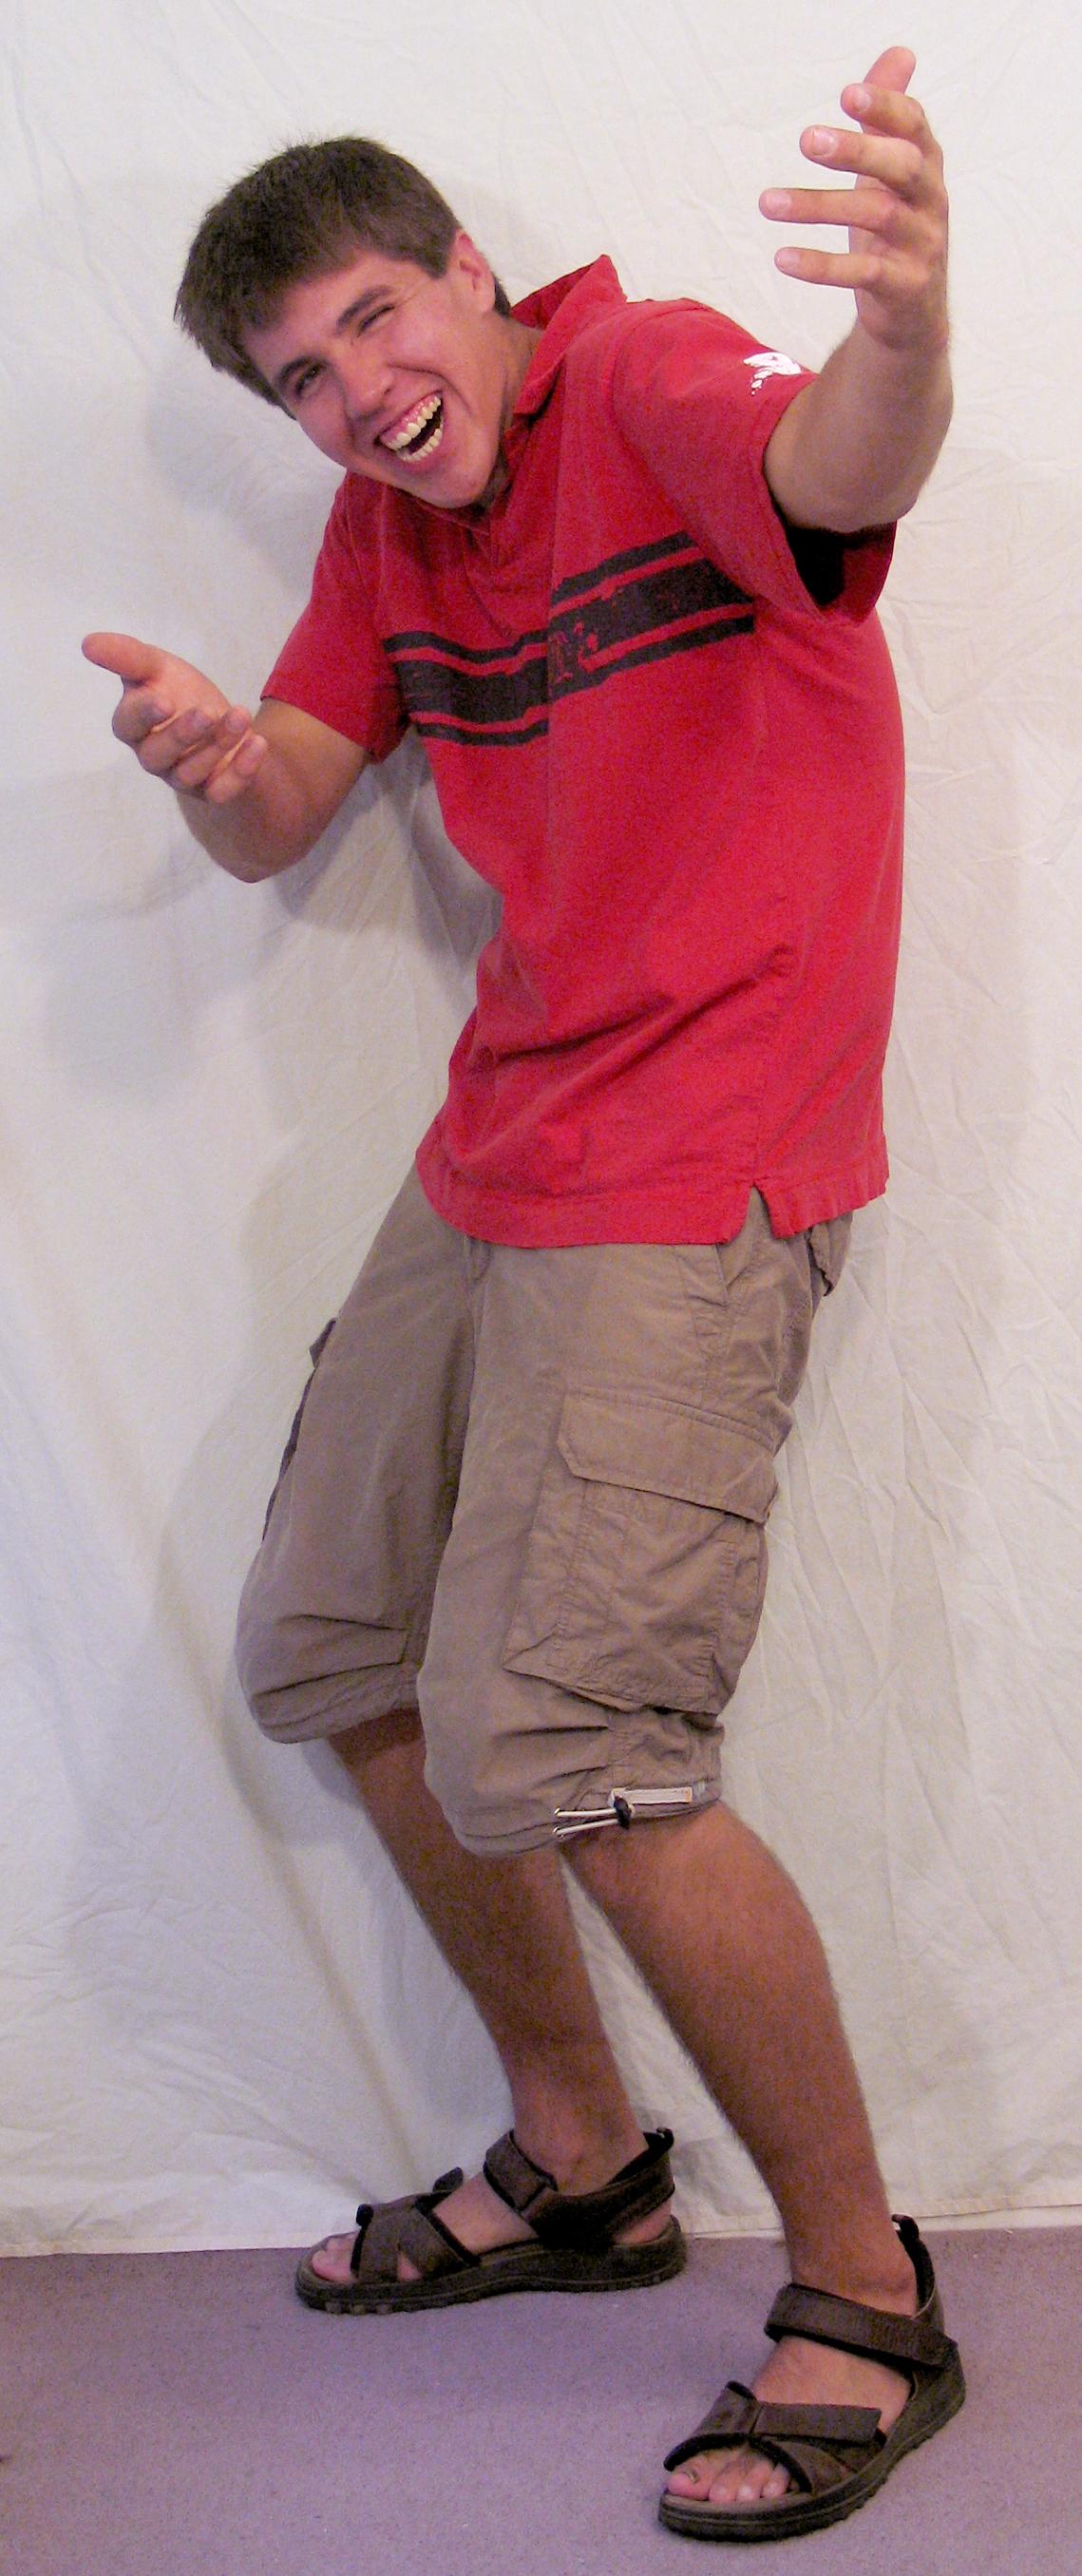 Wookiestock: Lemme Hug Yall